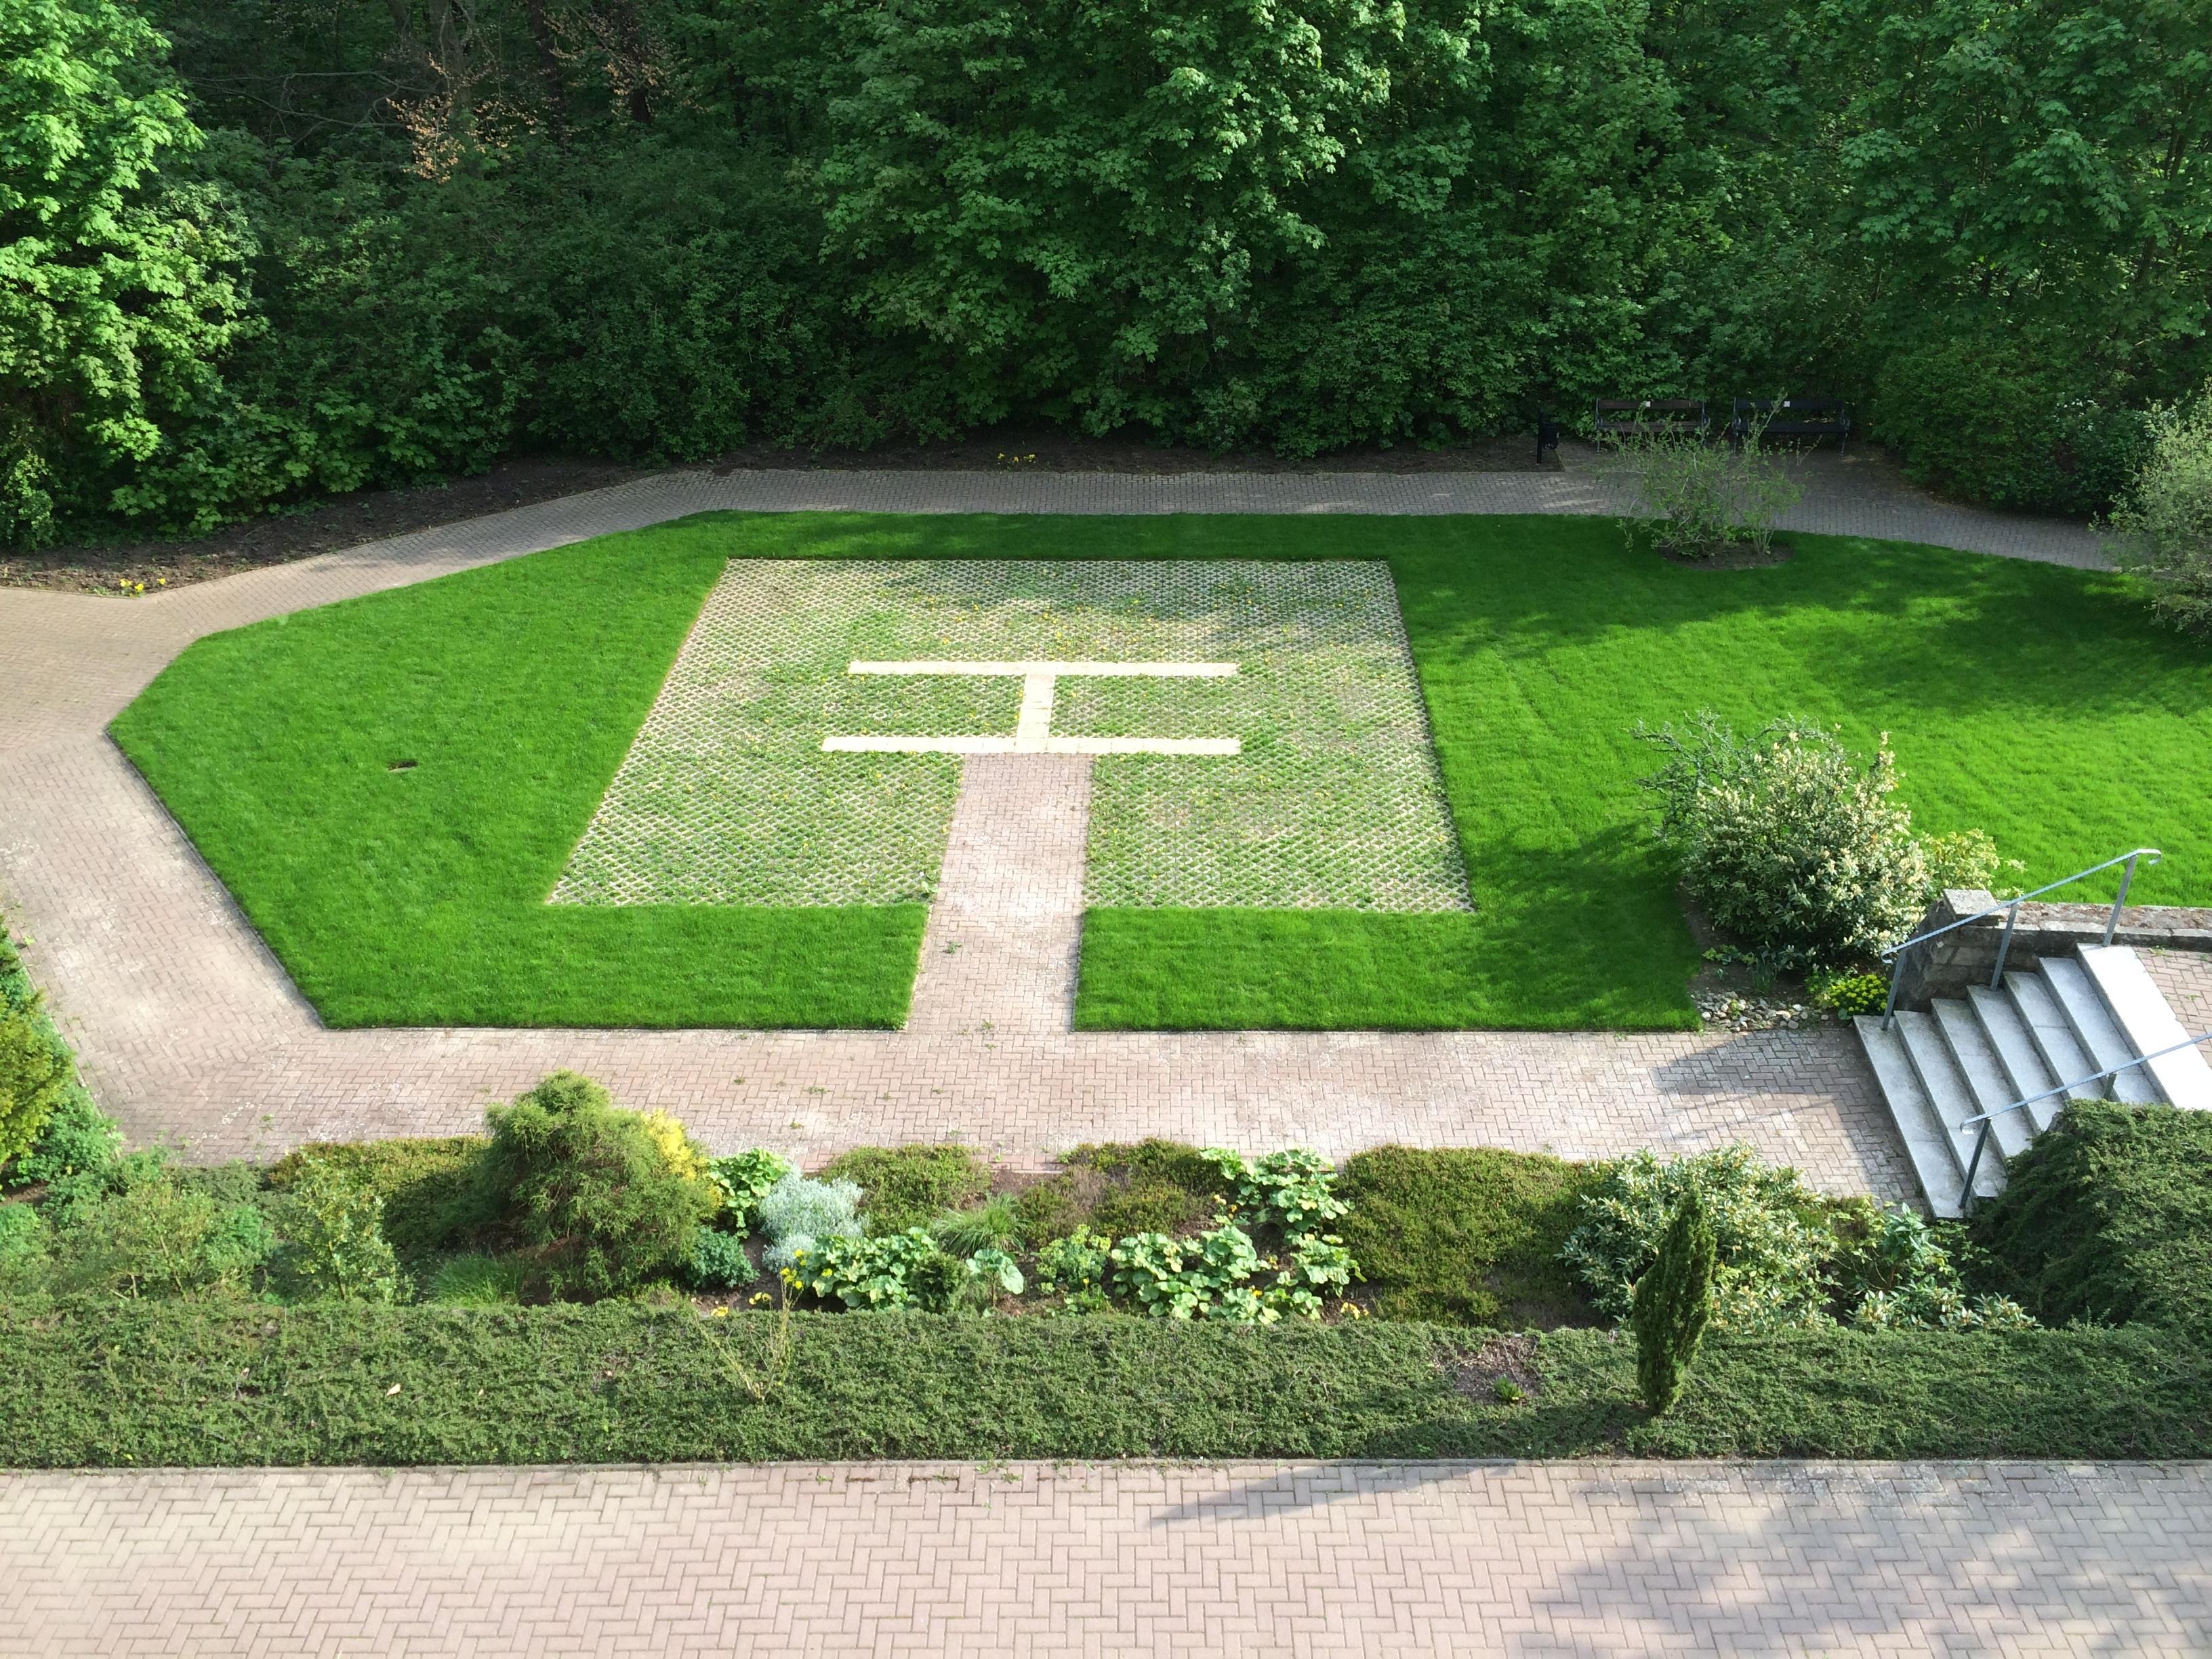 Nature Grass Lawn Meadow Spring Park Backyard Garden Memorial Landscaping  Helipad Shrub Estate Yard Flooring Landscape